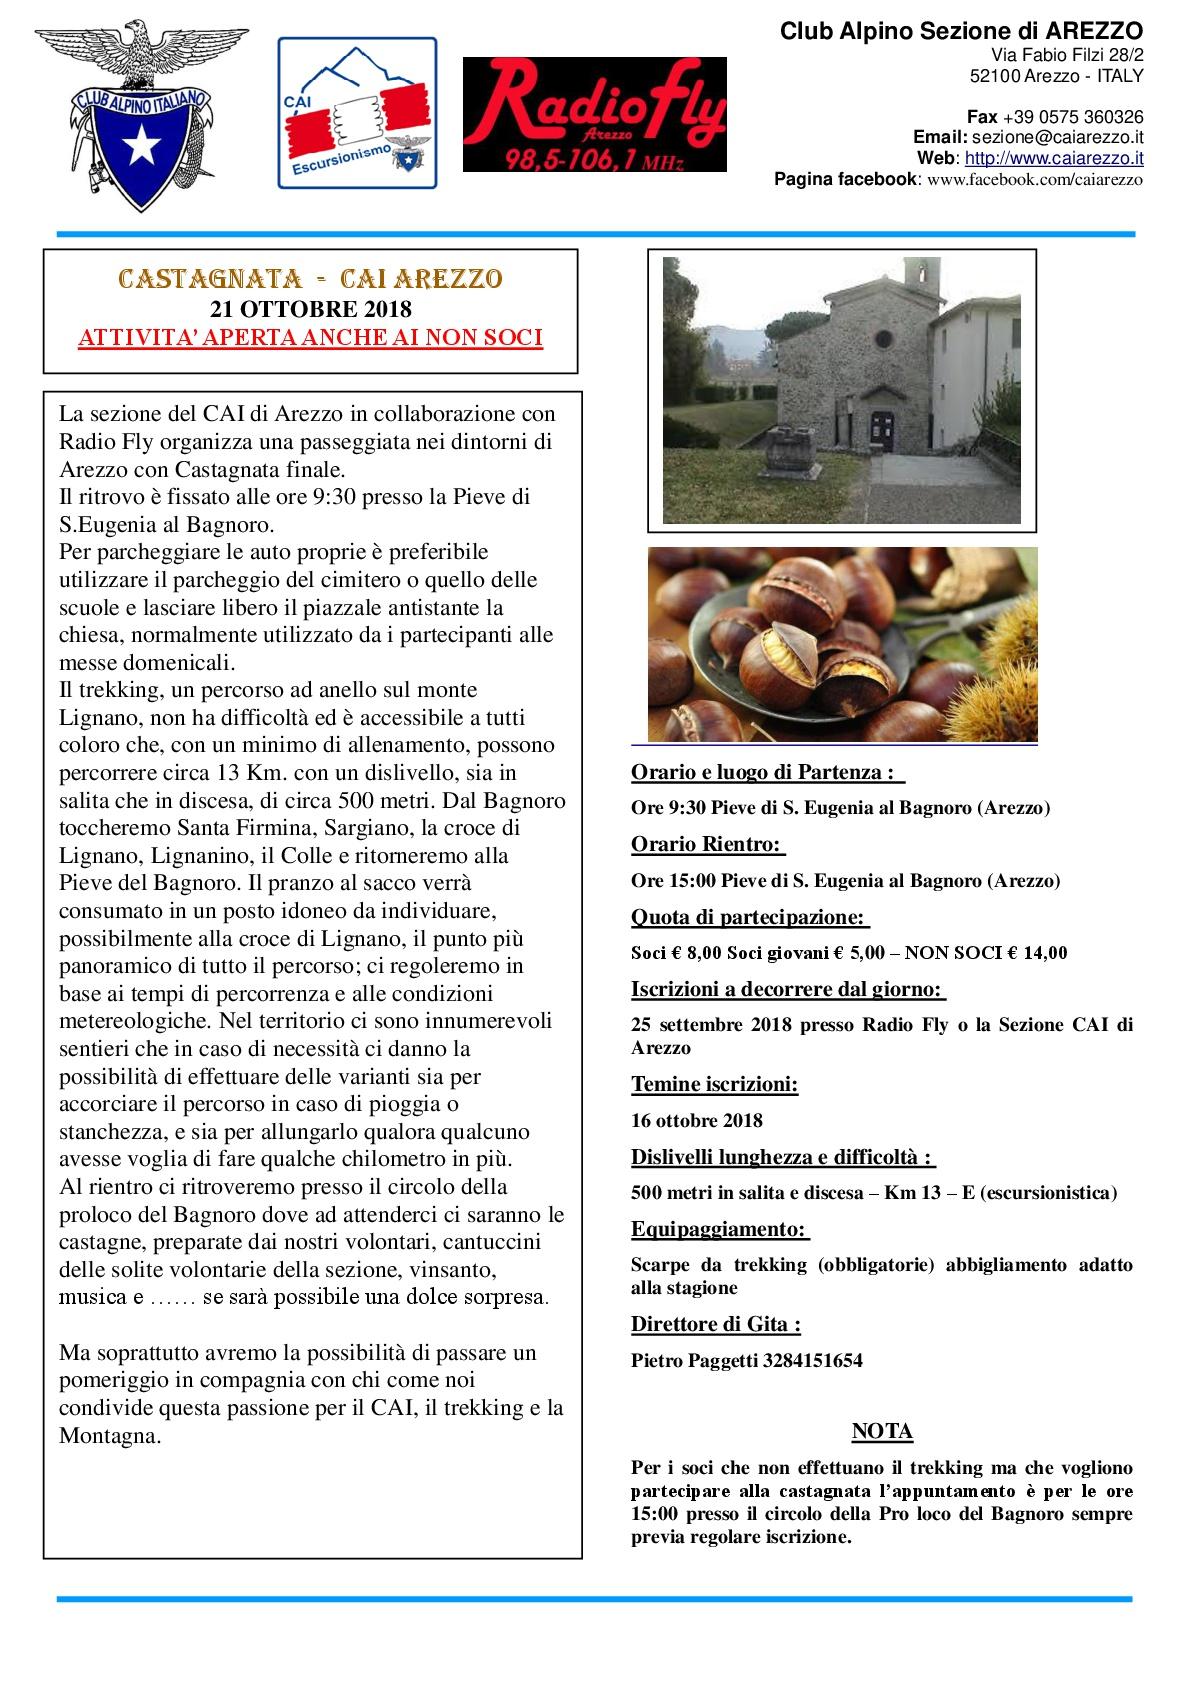 21 OTTOBRE 2018: CASTAGNATA